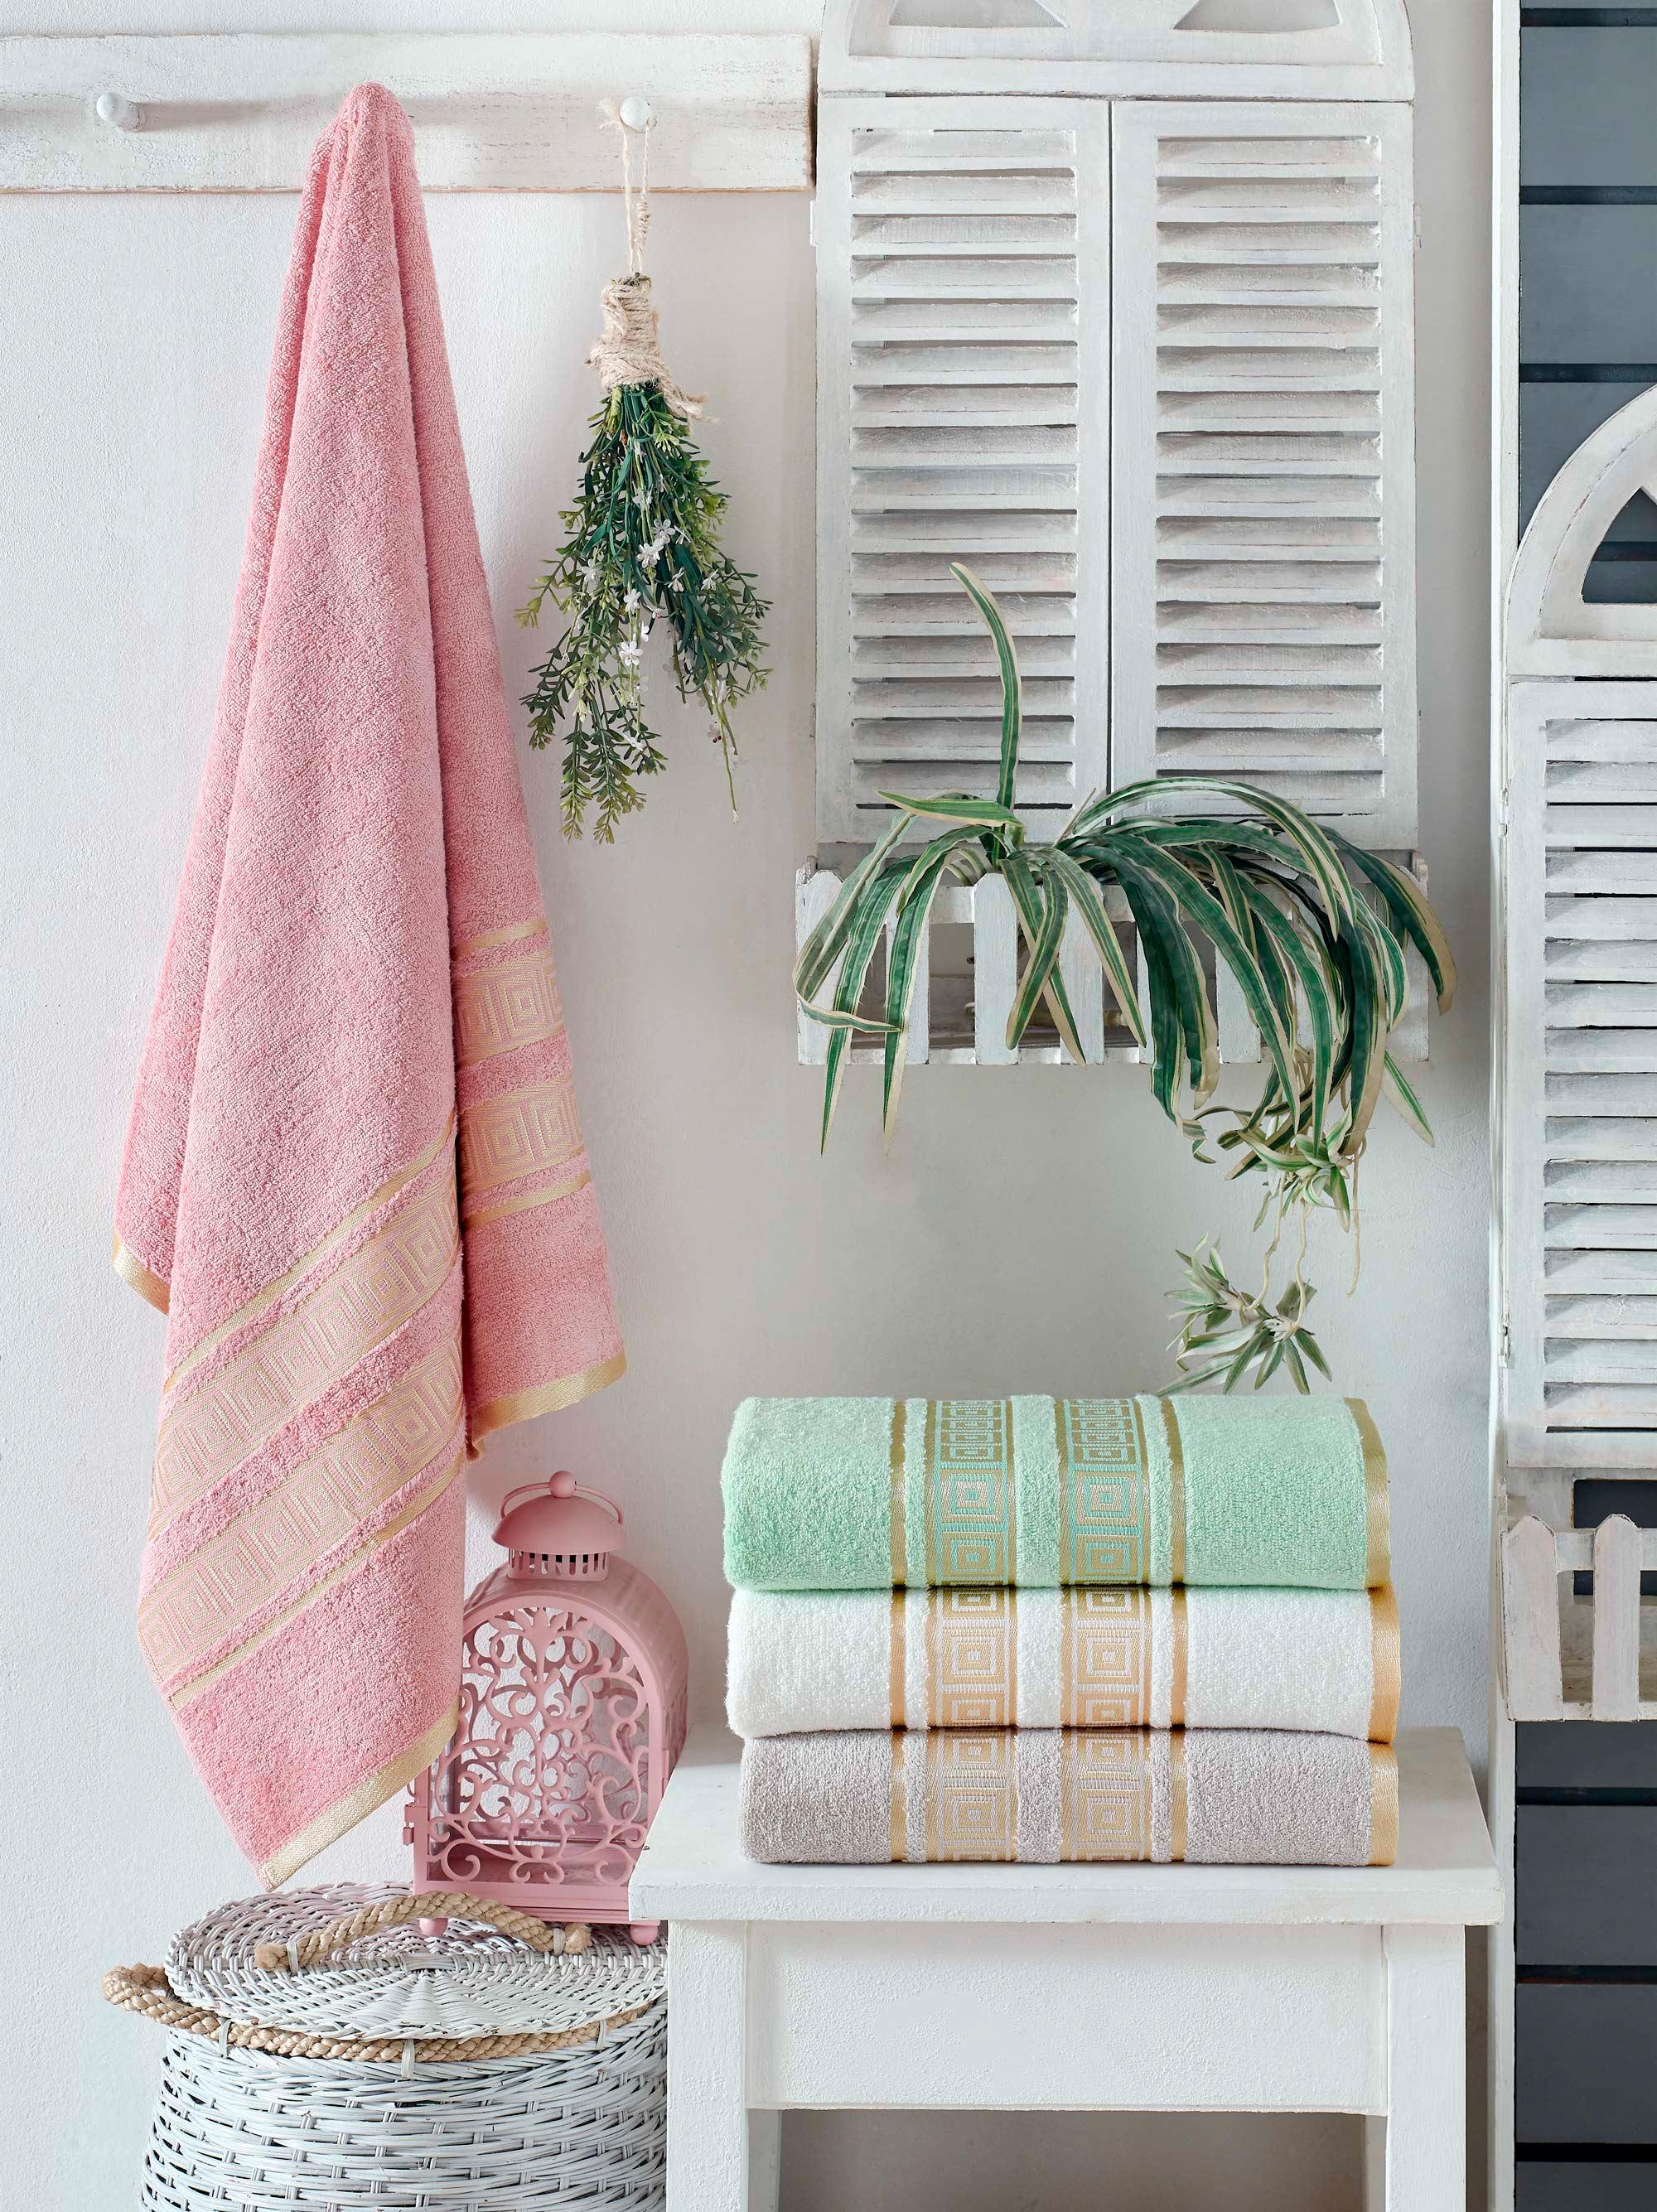 Купить Полотенца DO'n'CO, Полотенце Pansy (50х90 см - 4 шт), Турция, Белый, Зеленый, Розовый, Бамбук